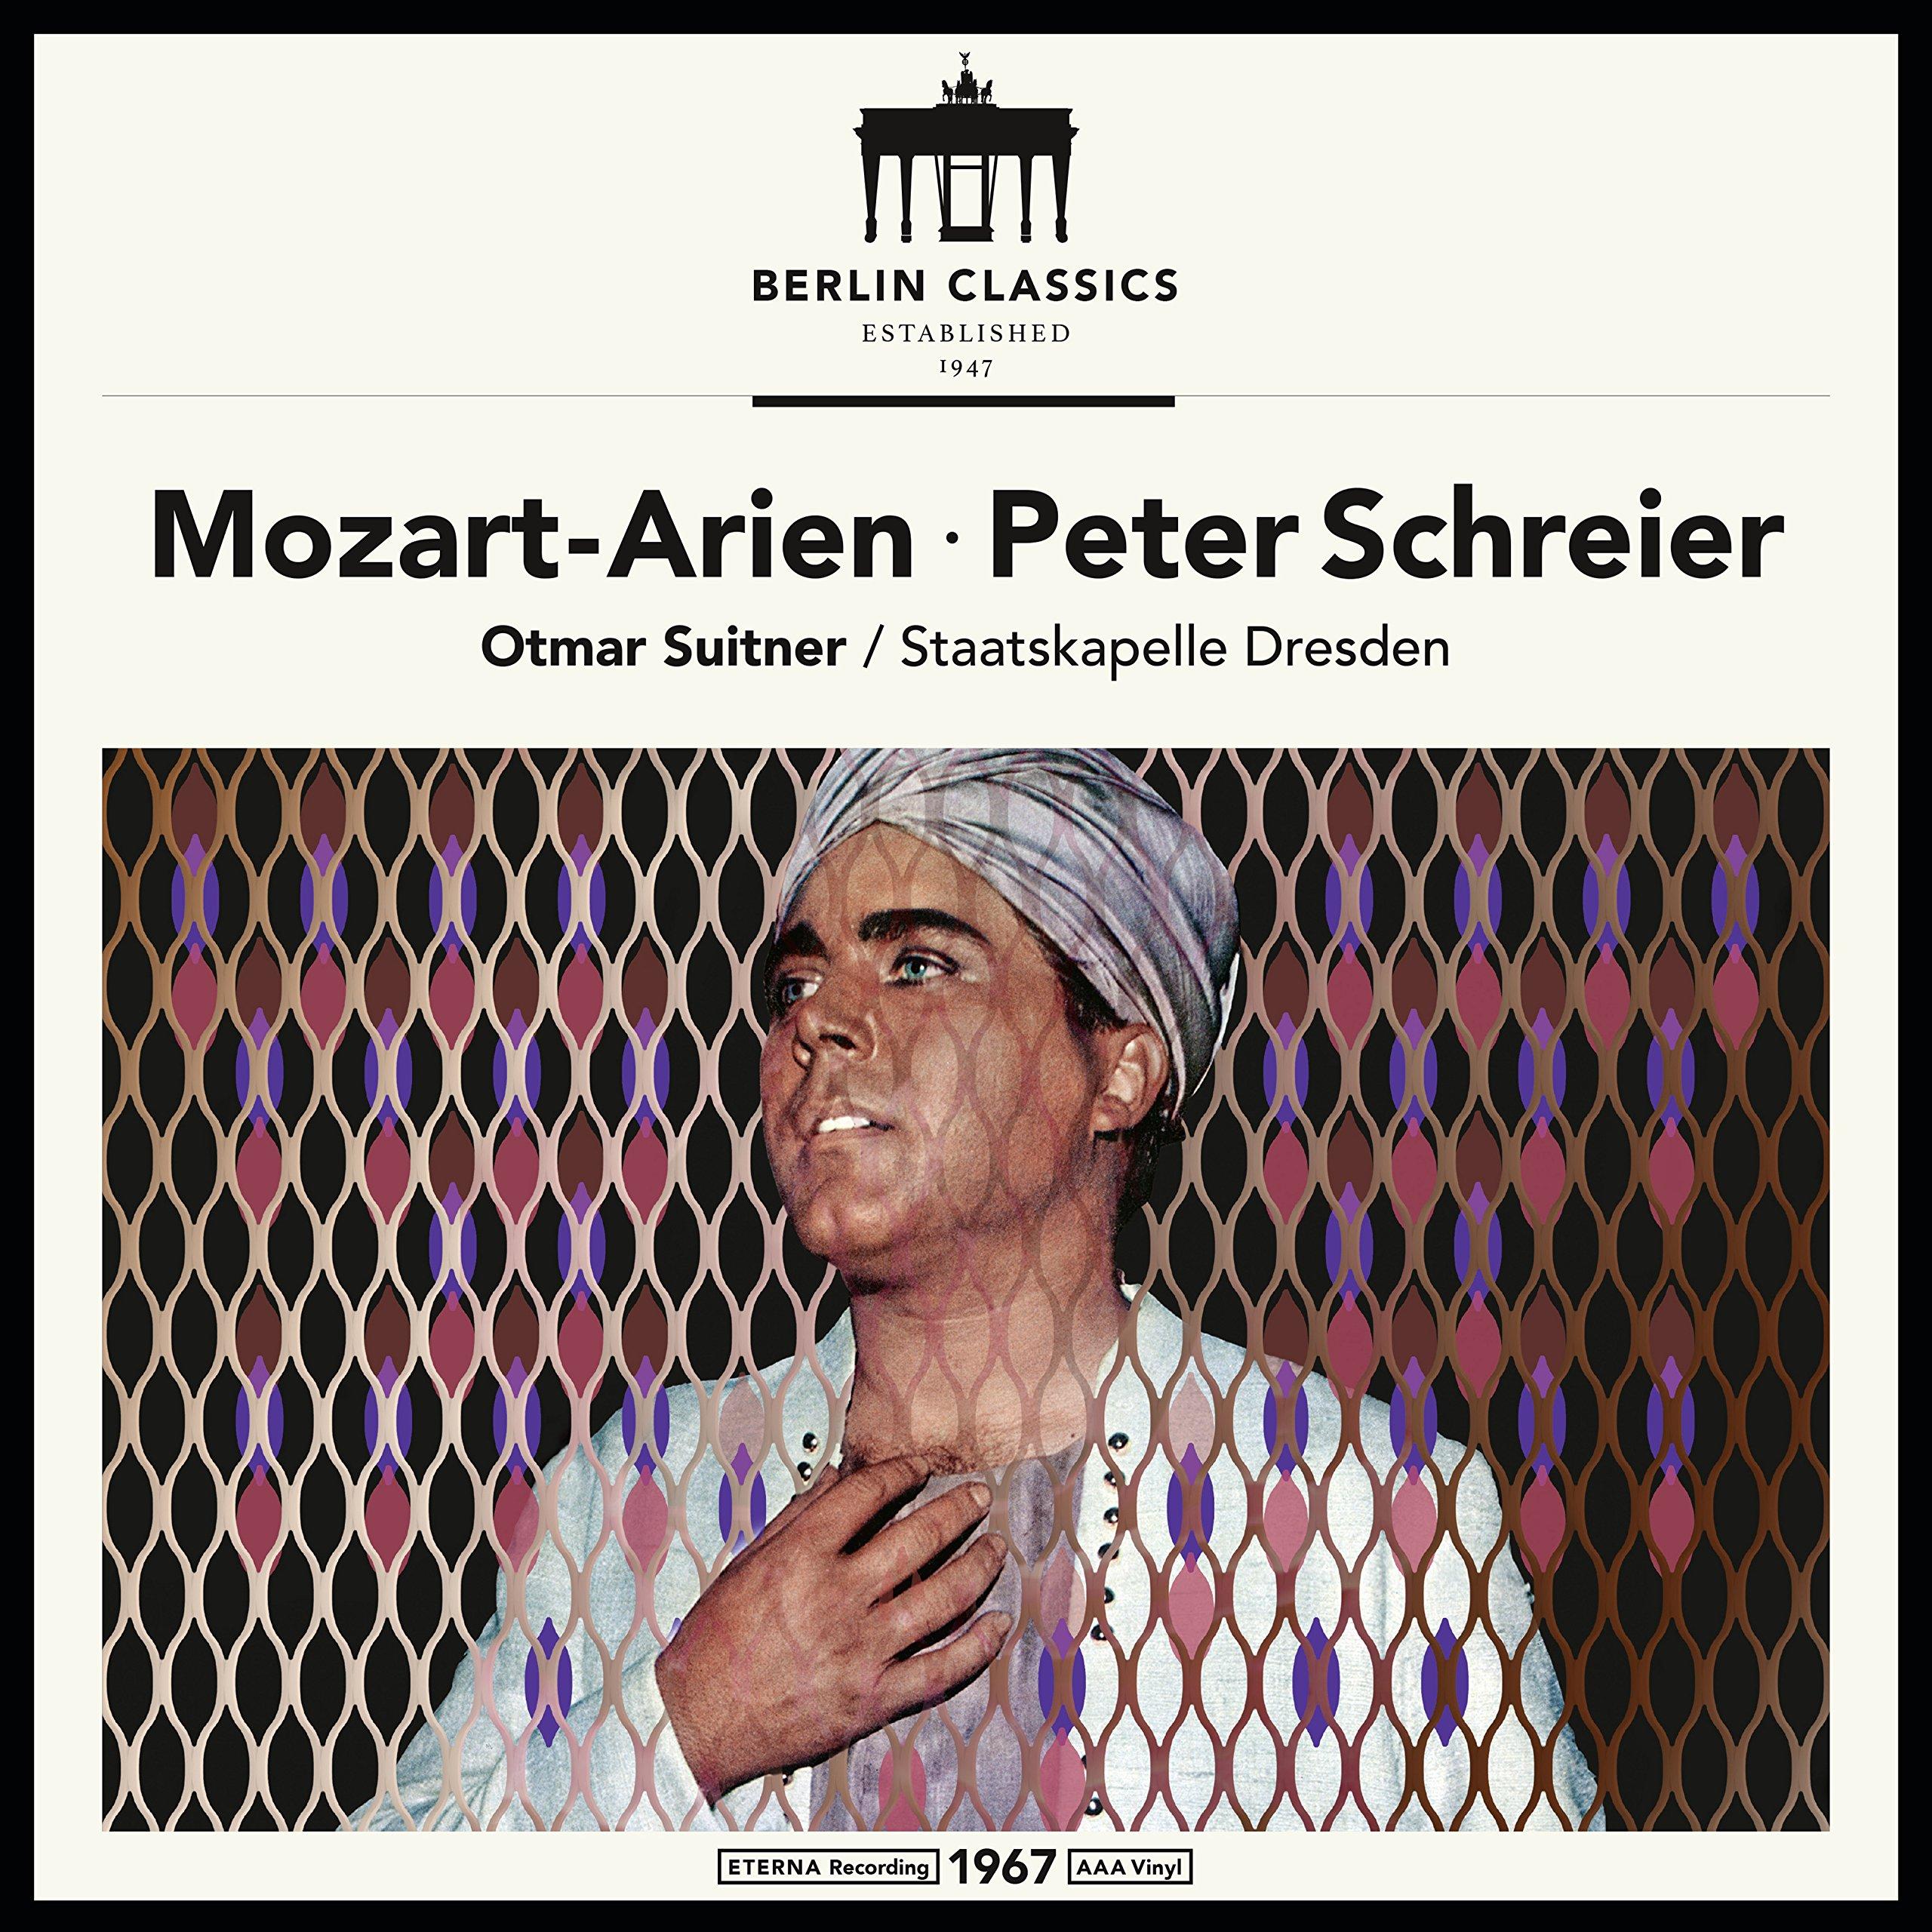 Mozart Opera Arias by Berlin Classics